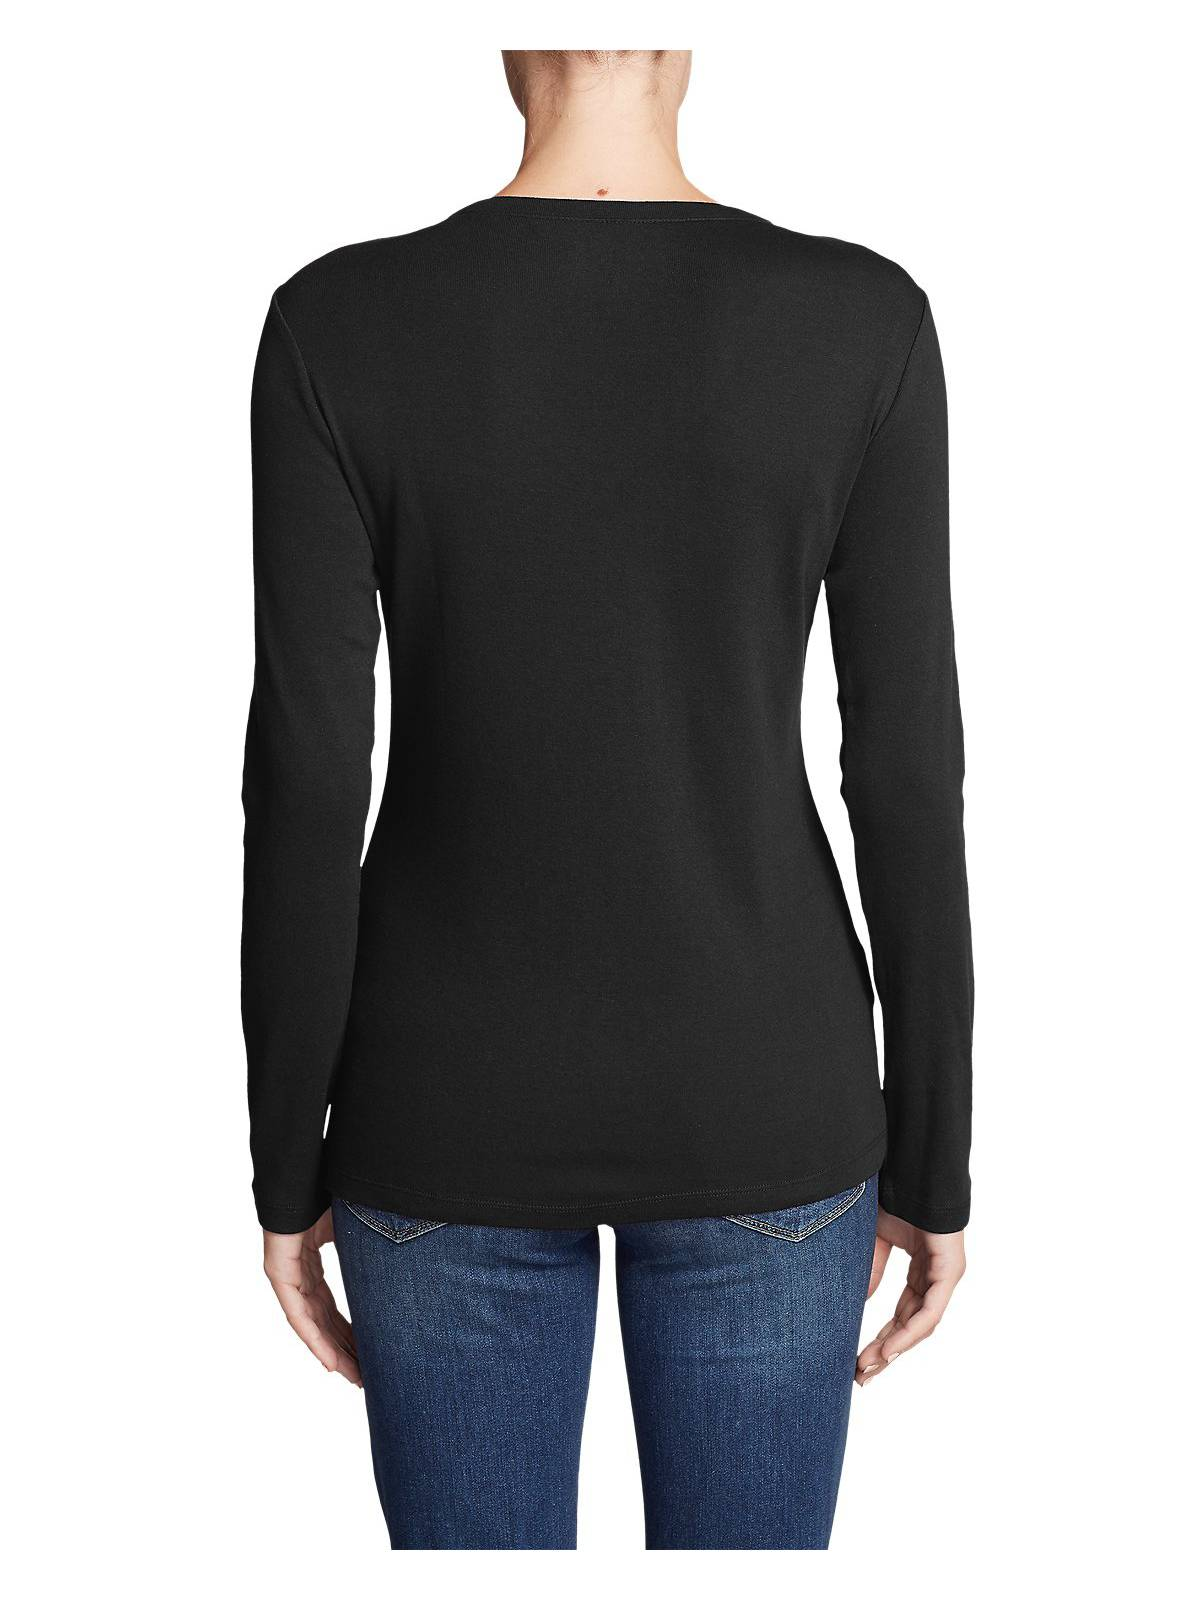 Eddie-Bauer-Women-039-s-Favorite-Long-Sleeve-V-Neck-T-Shirt thumbnail 4